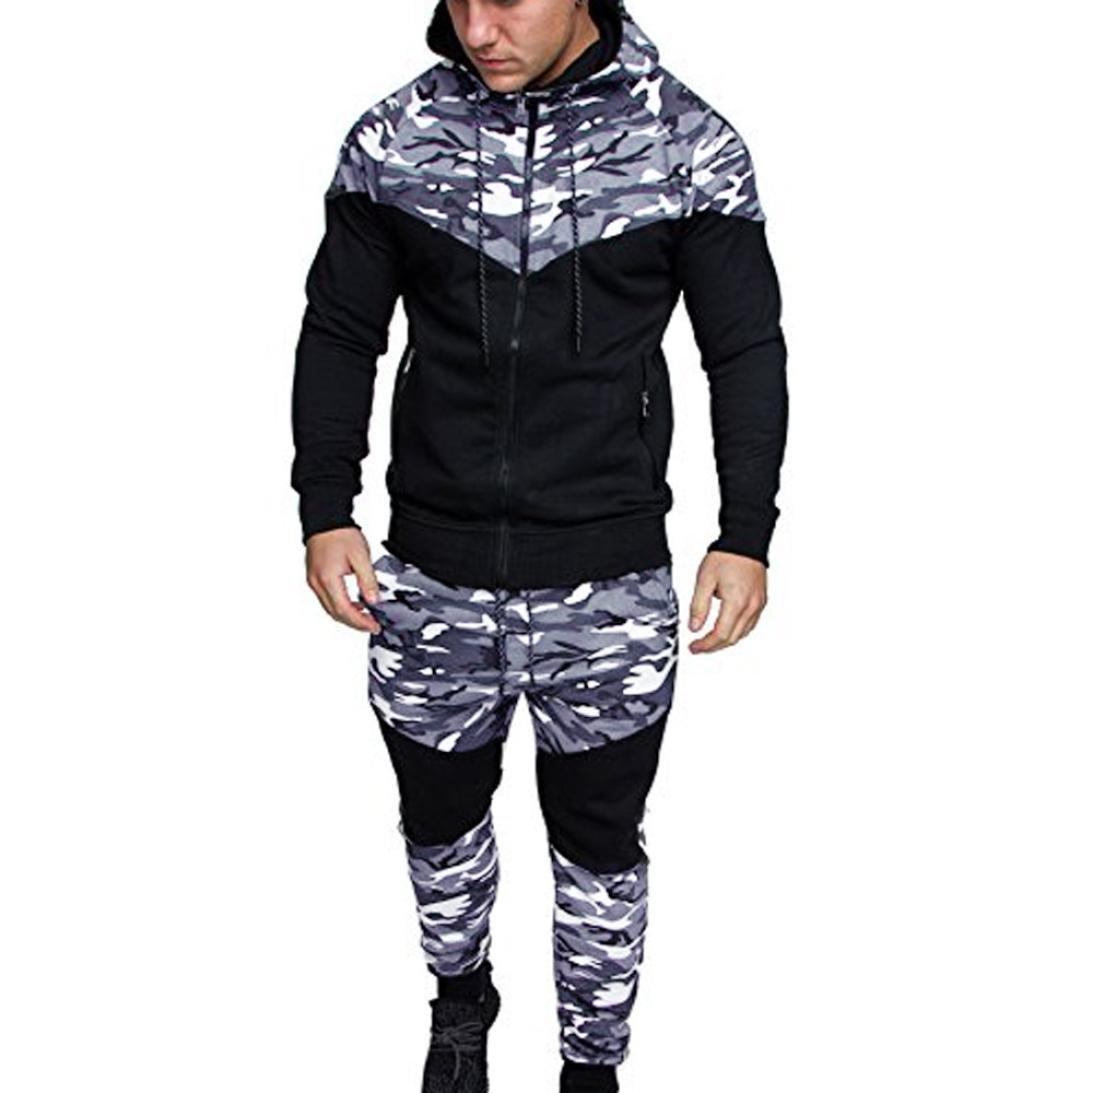 TOOPOOT Men's Top Pants Sports Sets,Men New Pocket Hoodie Camouflage Coat Suit Tracksuit (Size:XXXL, Black)